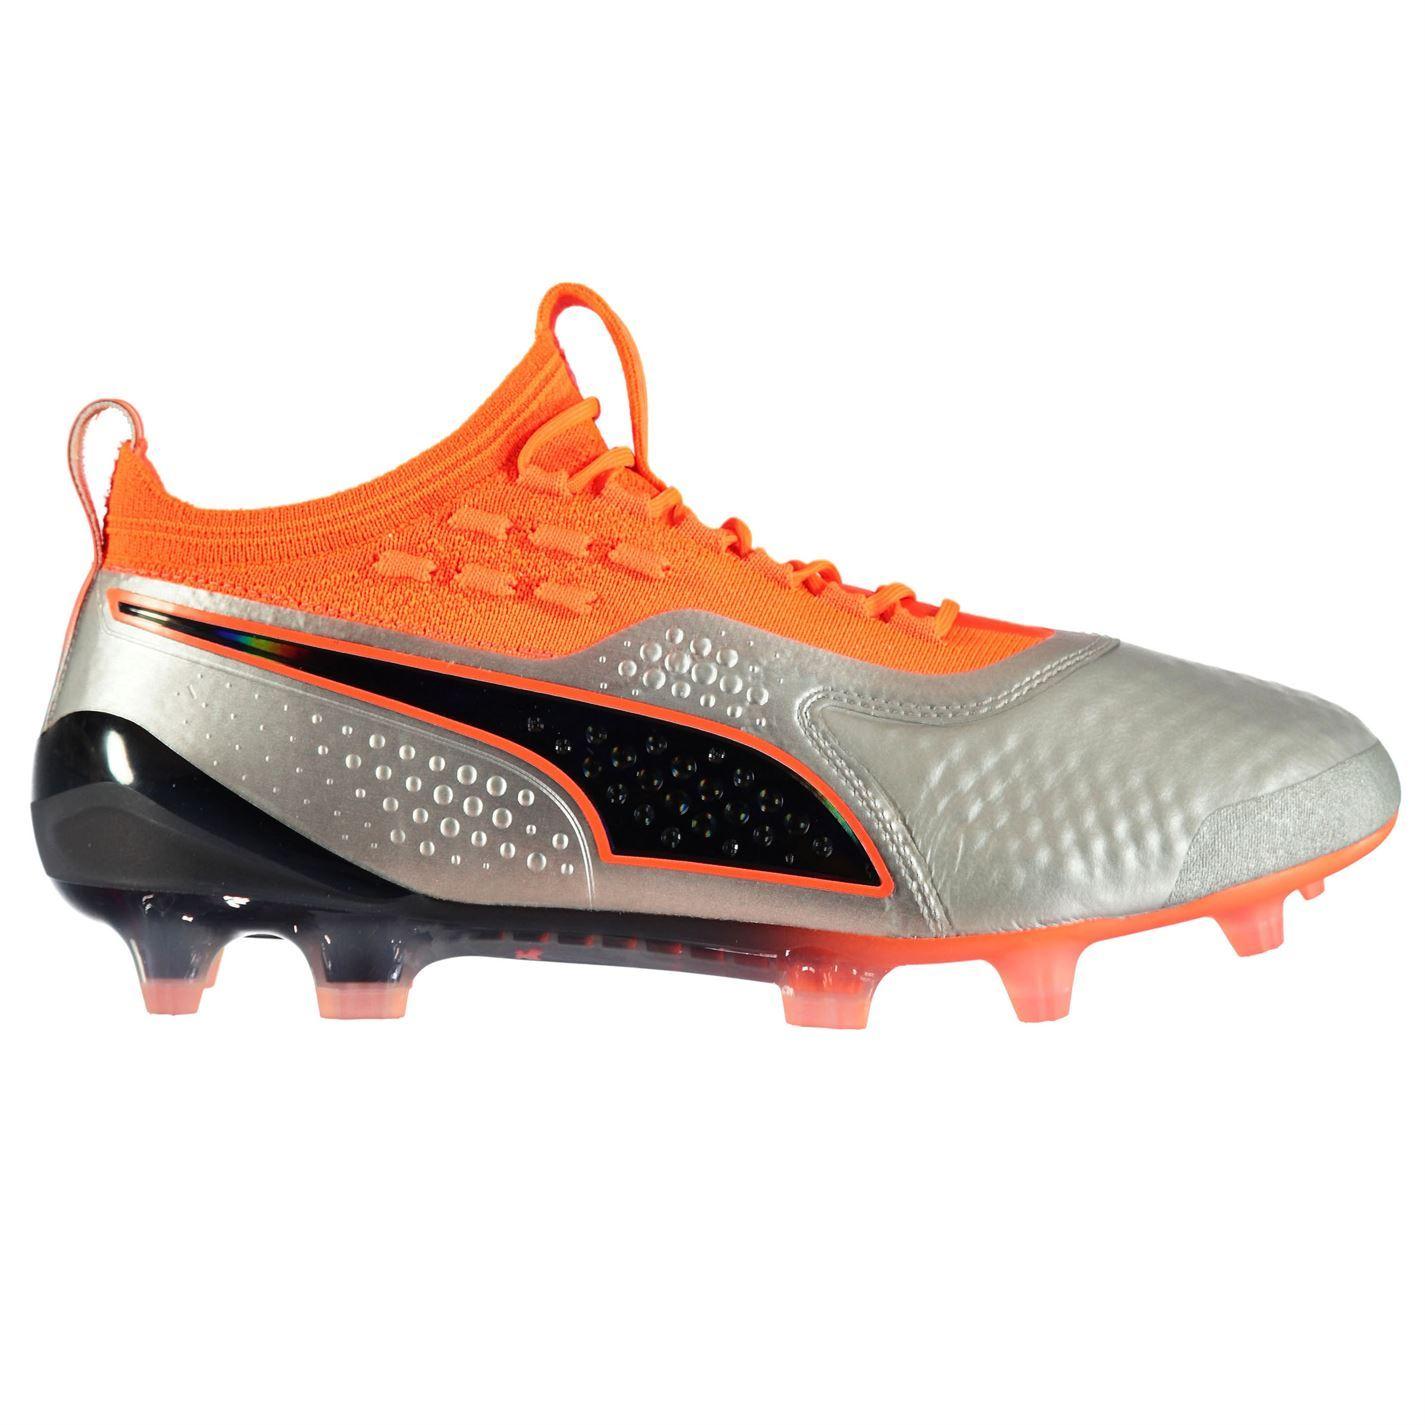 miniature 4 - PUMA 1 Fg Firm Ground Chaussures De Football Homme Football Chaussures Crampons